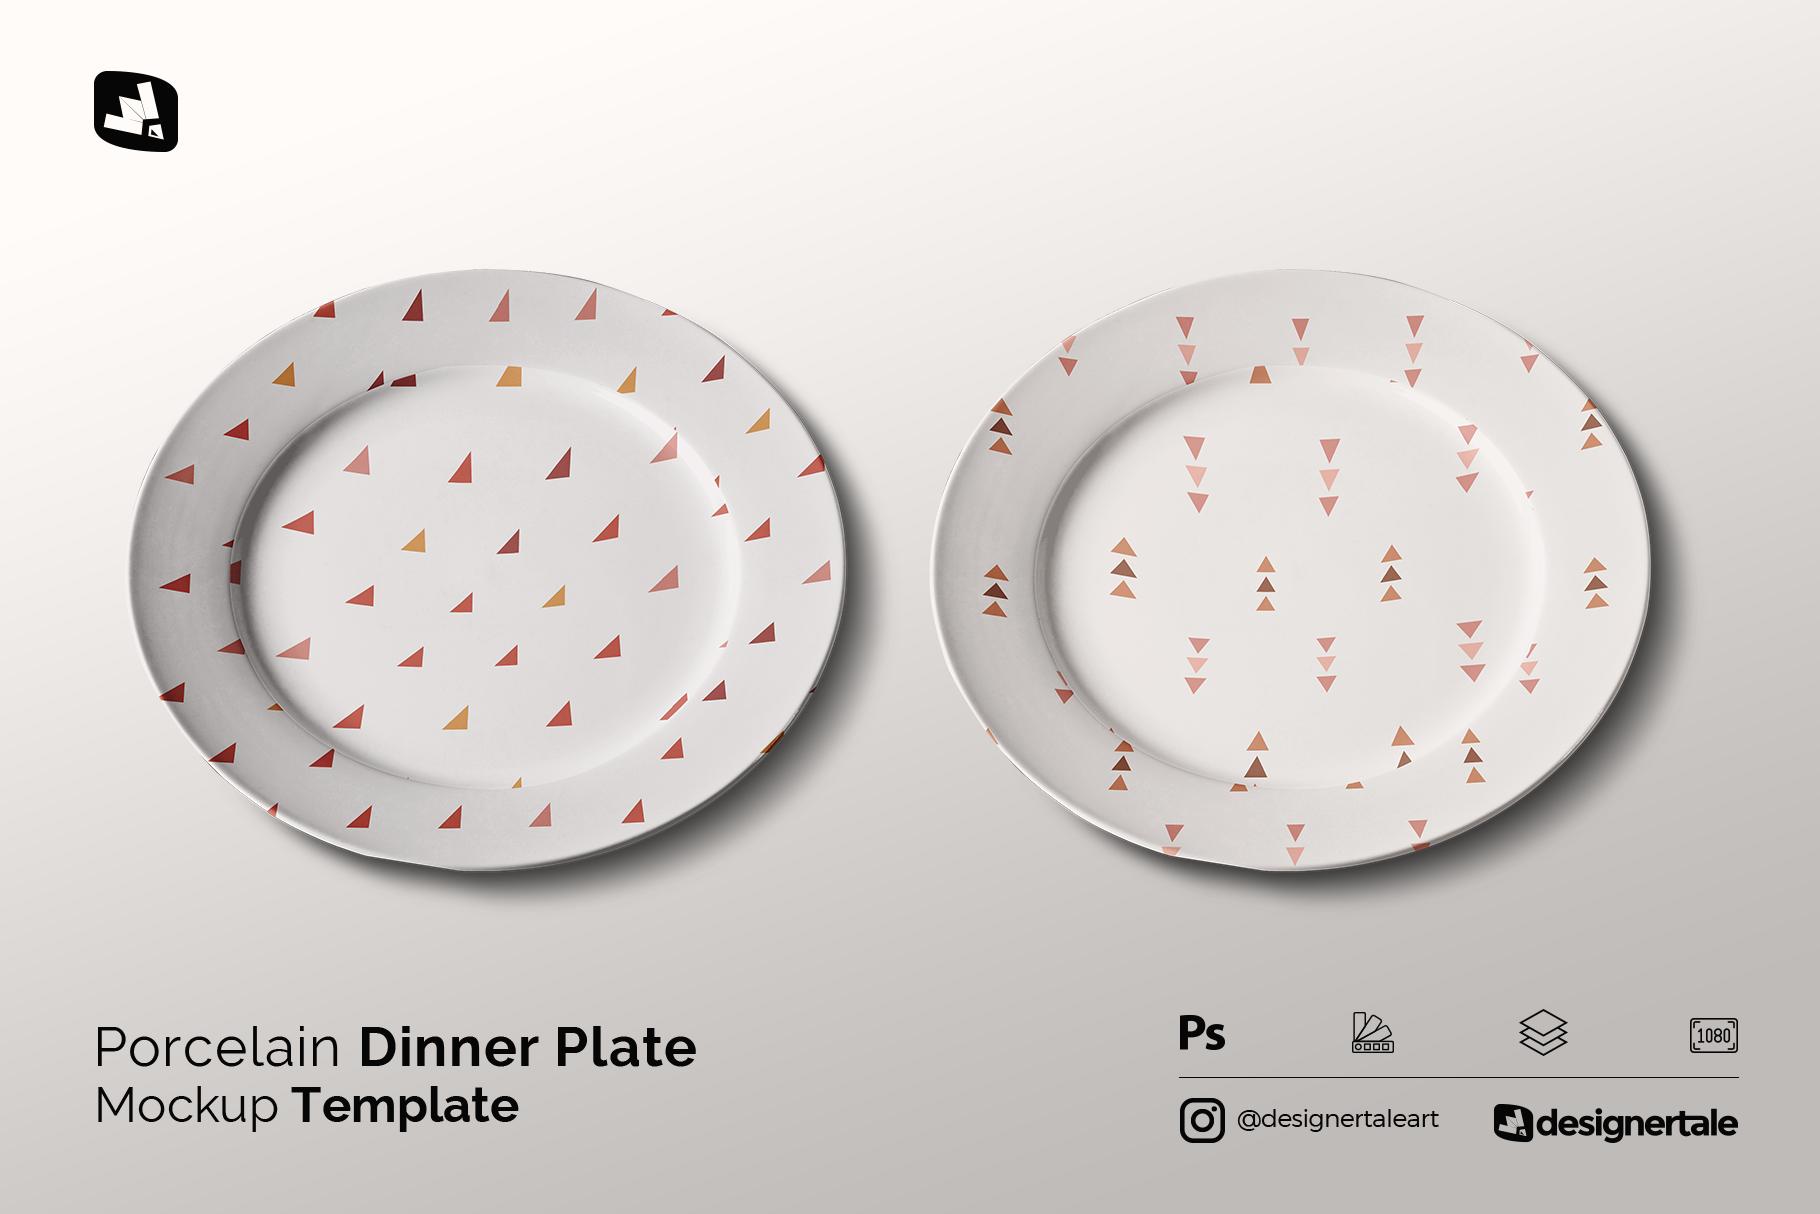 porcelain dinner plate mockup